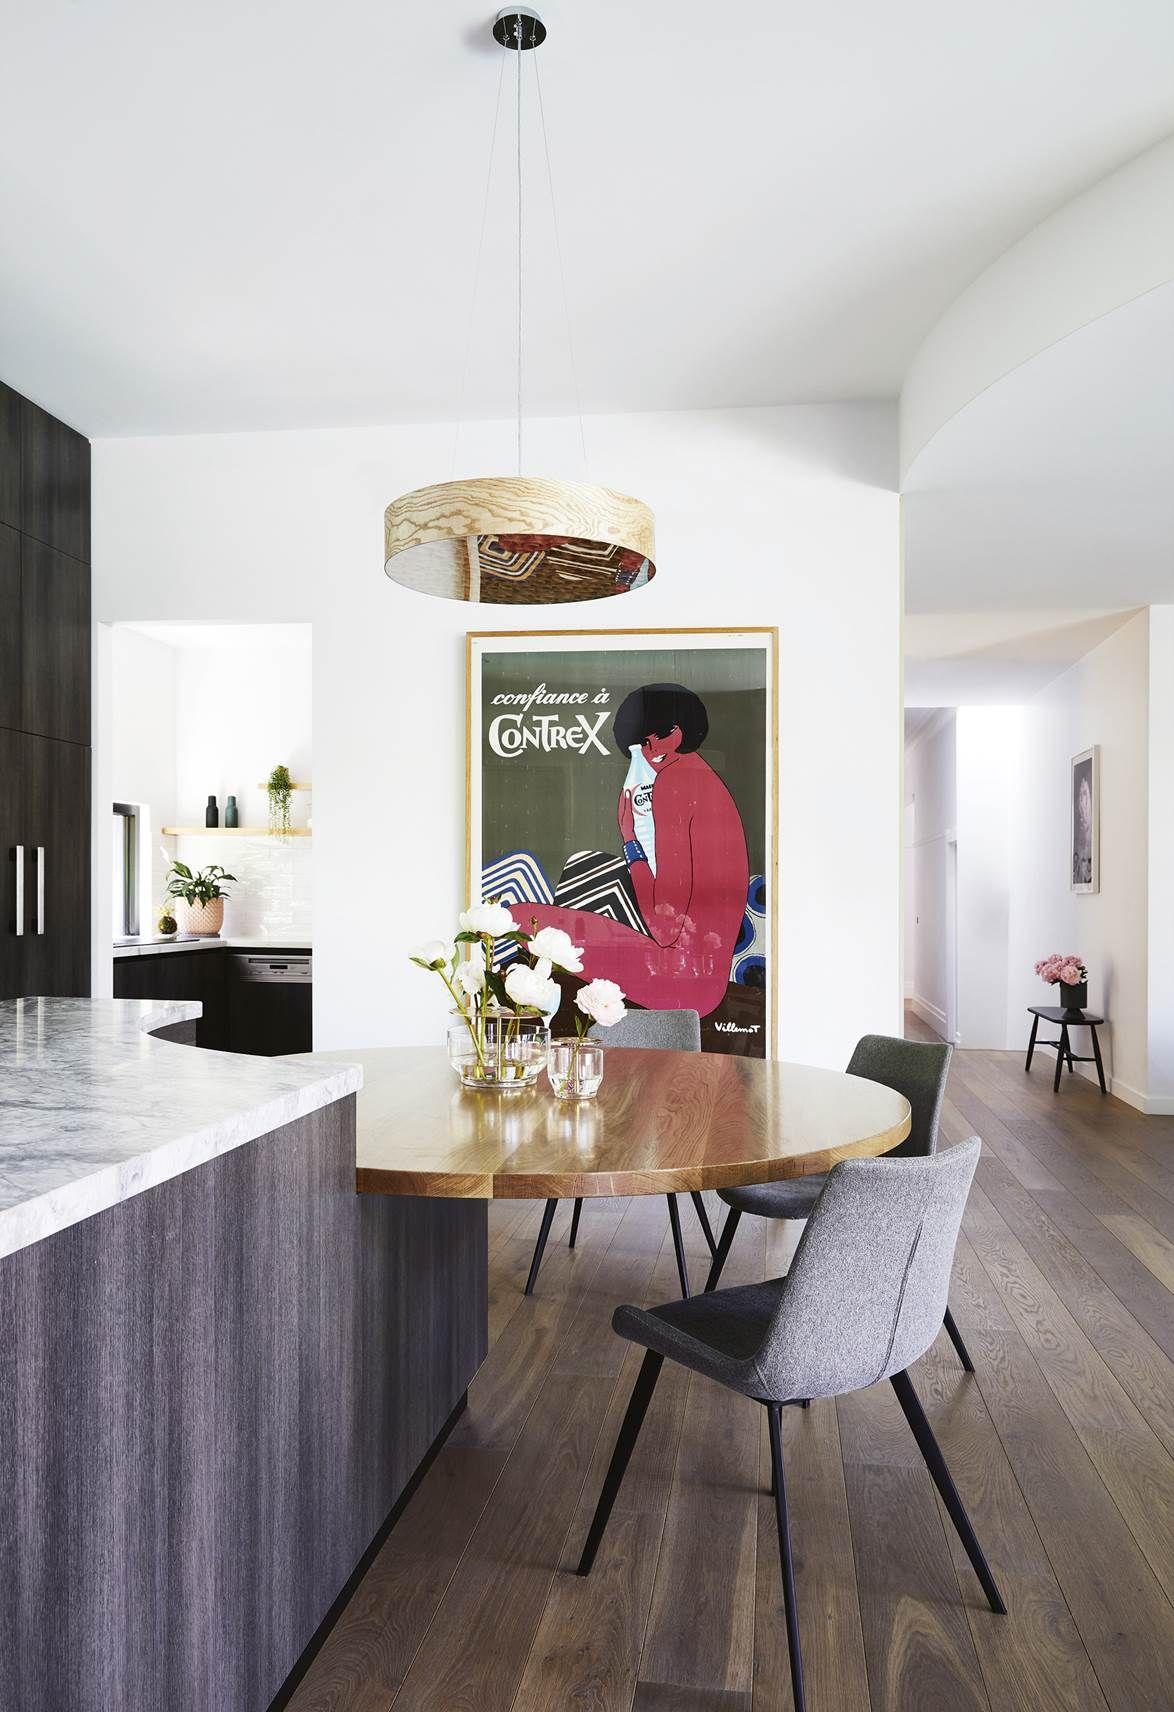 Pleasing Kitchen Inspiration 13 Of The Best Island Benches Machost Co Dining Chair Design Ideas Machostcouk